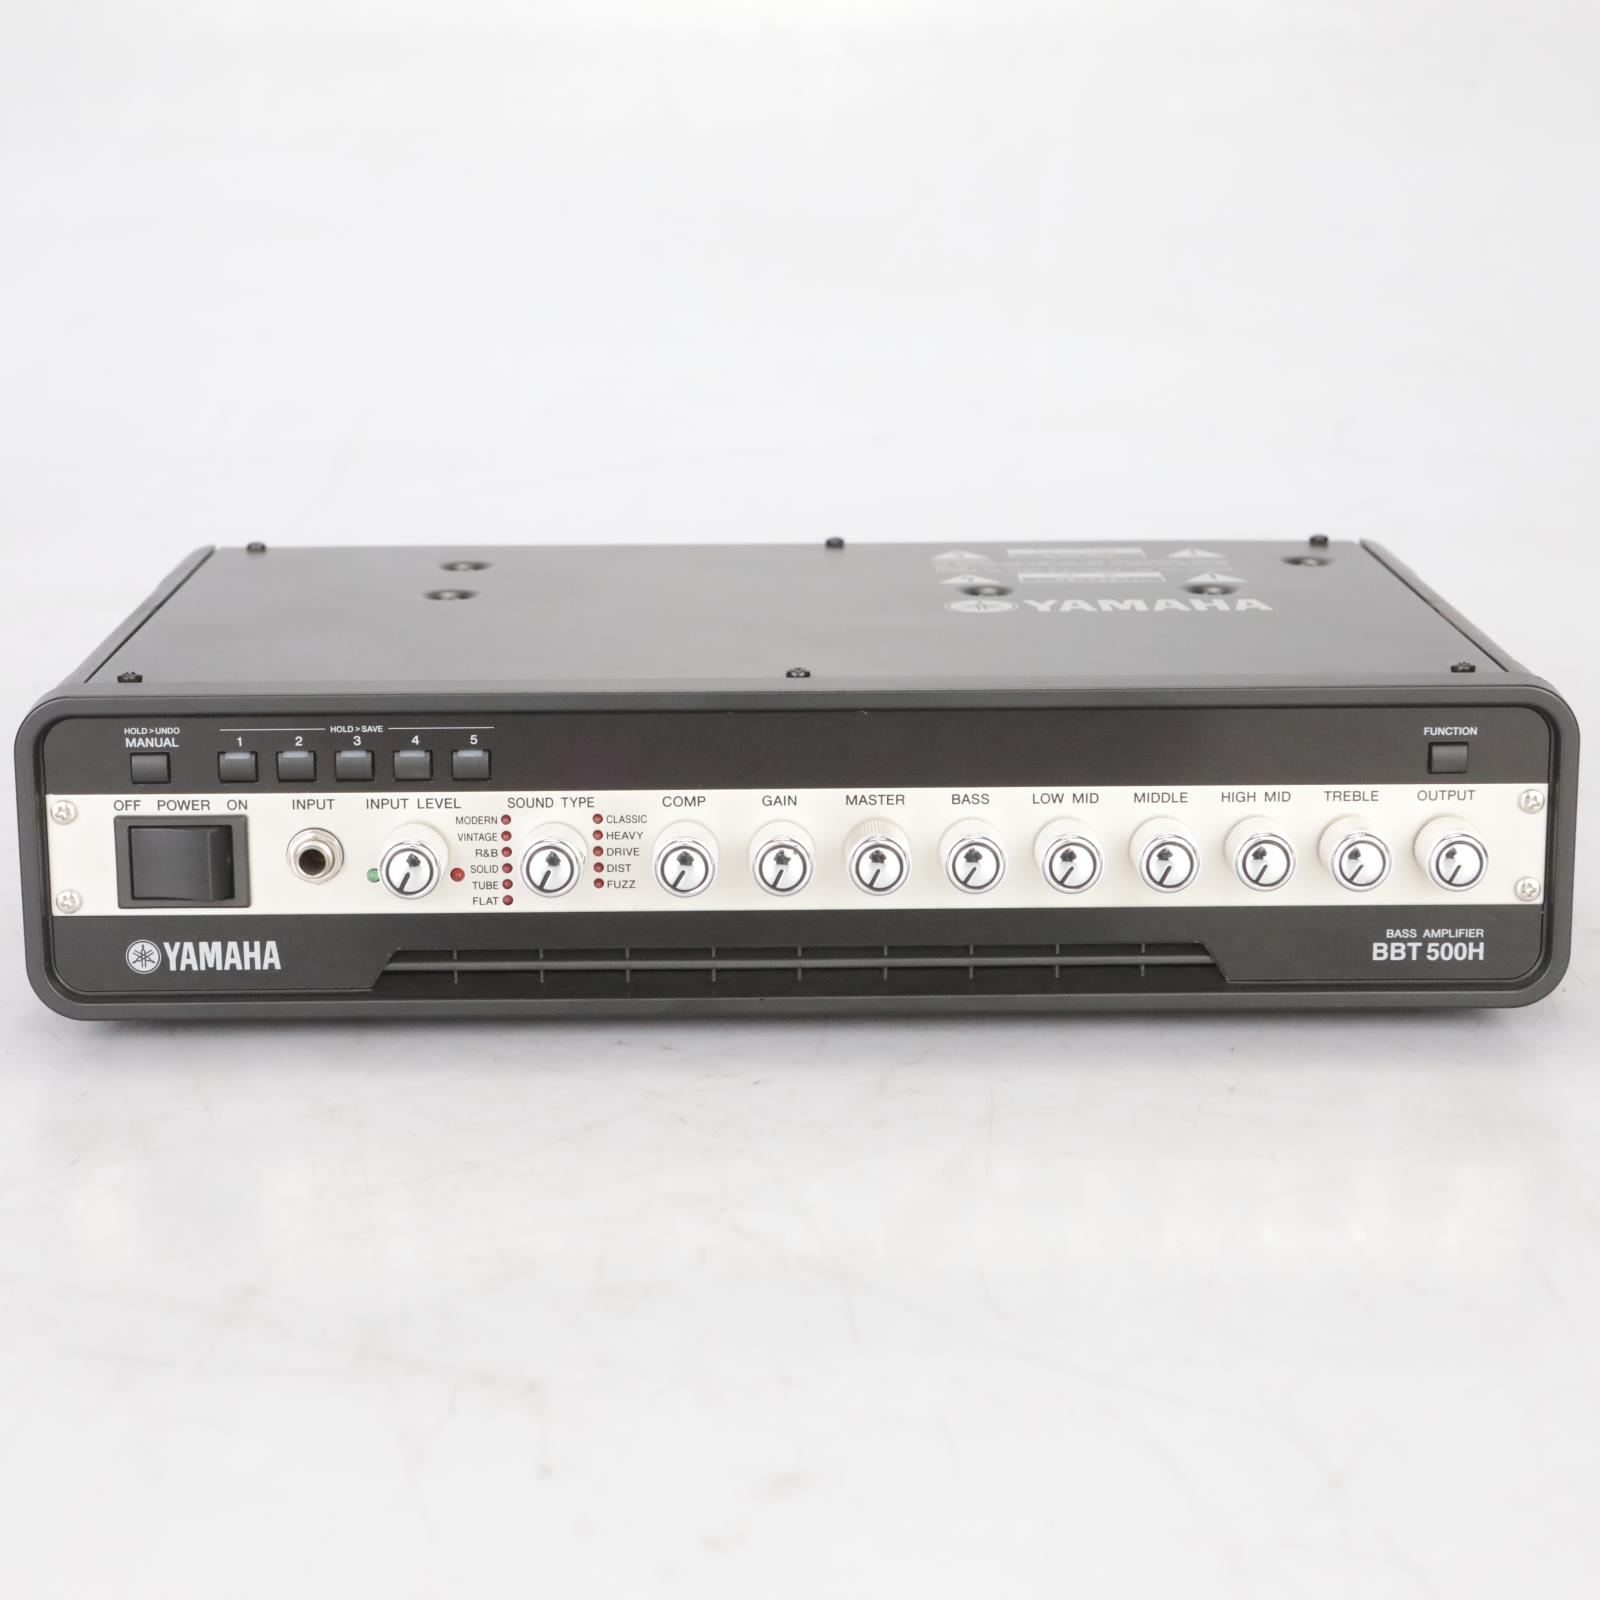 Yamaha BBT500H Bass Amplifier Head owned by Leland Sklar #38825